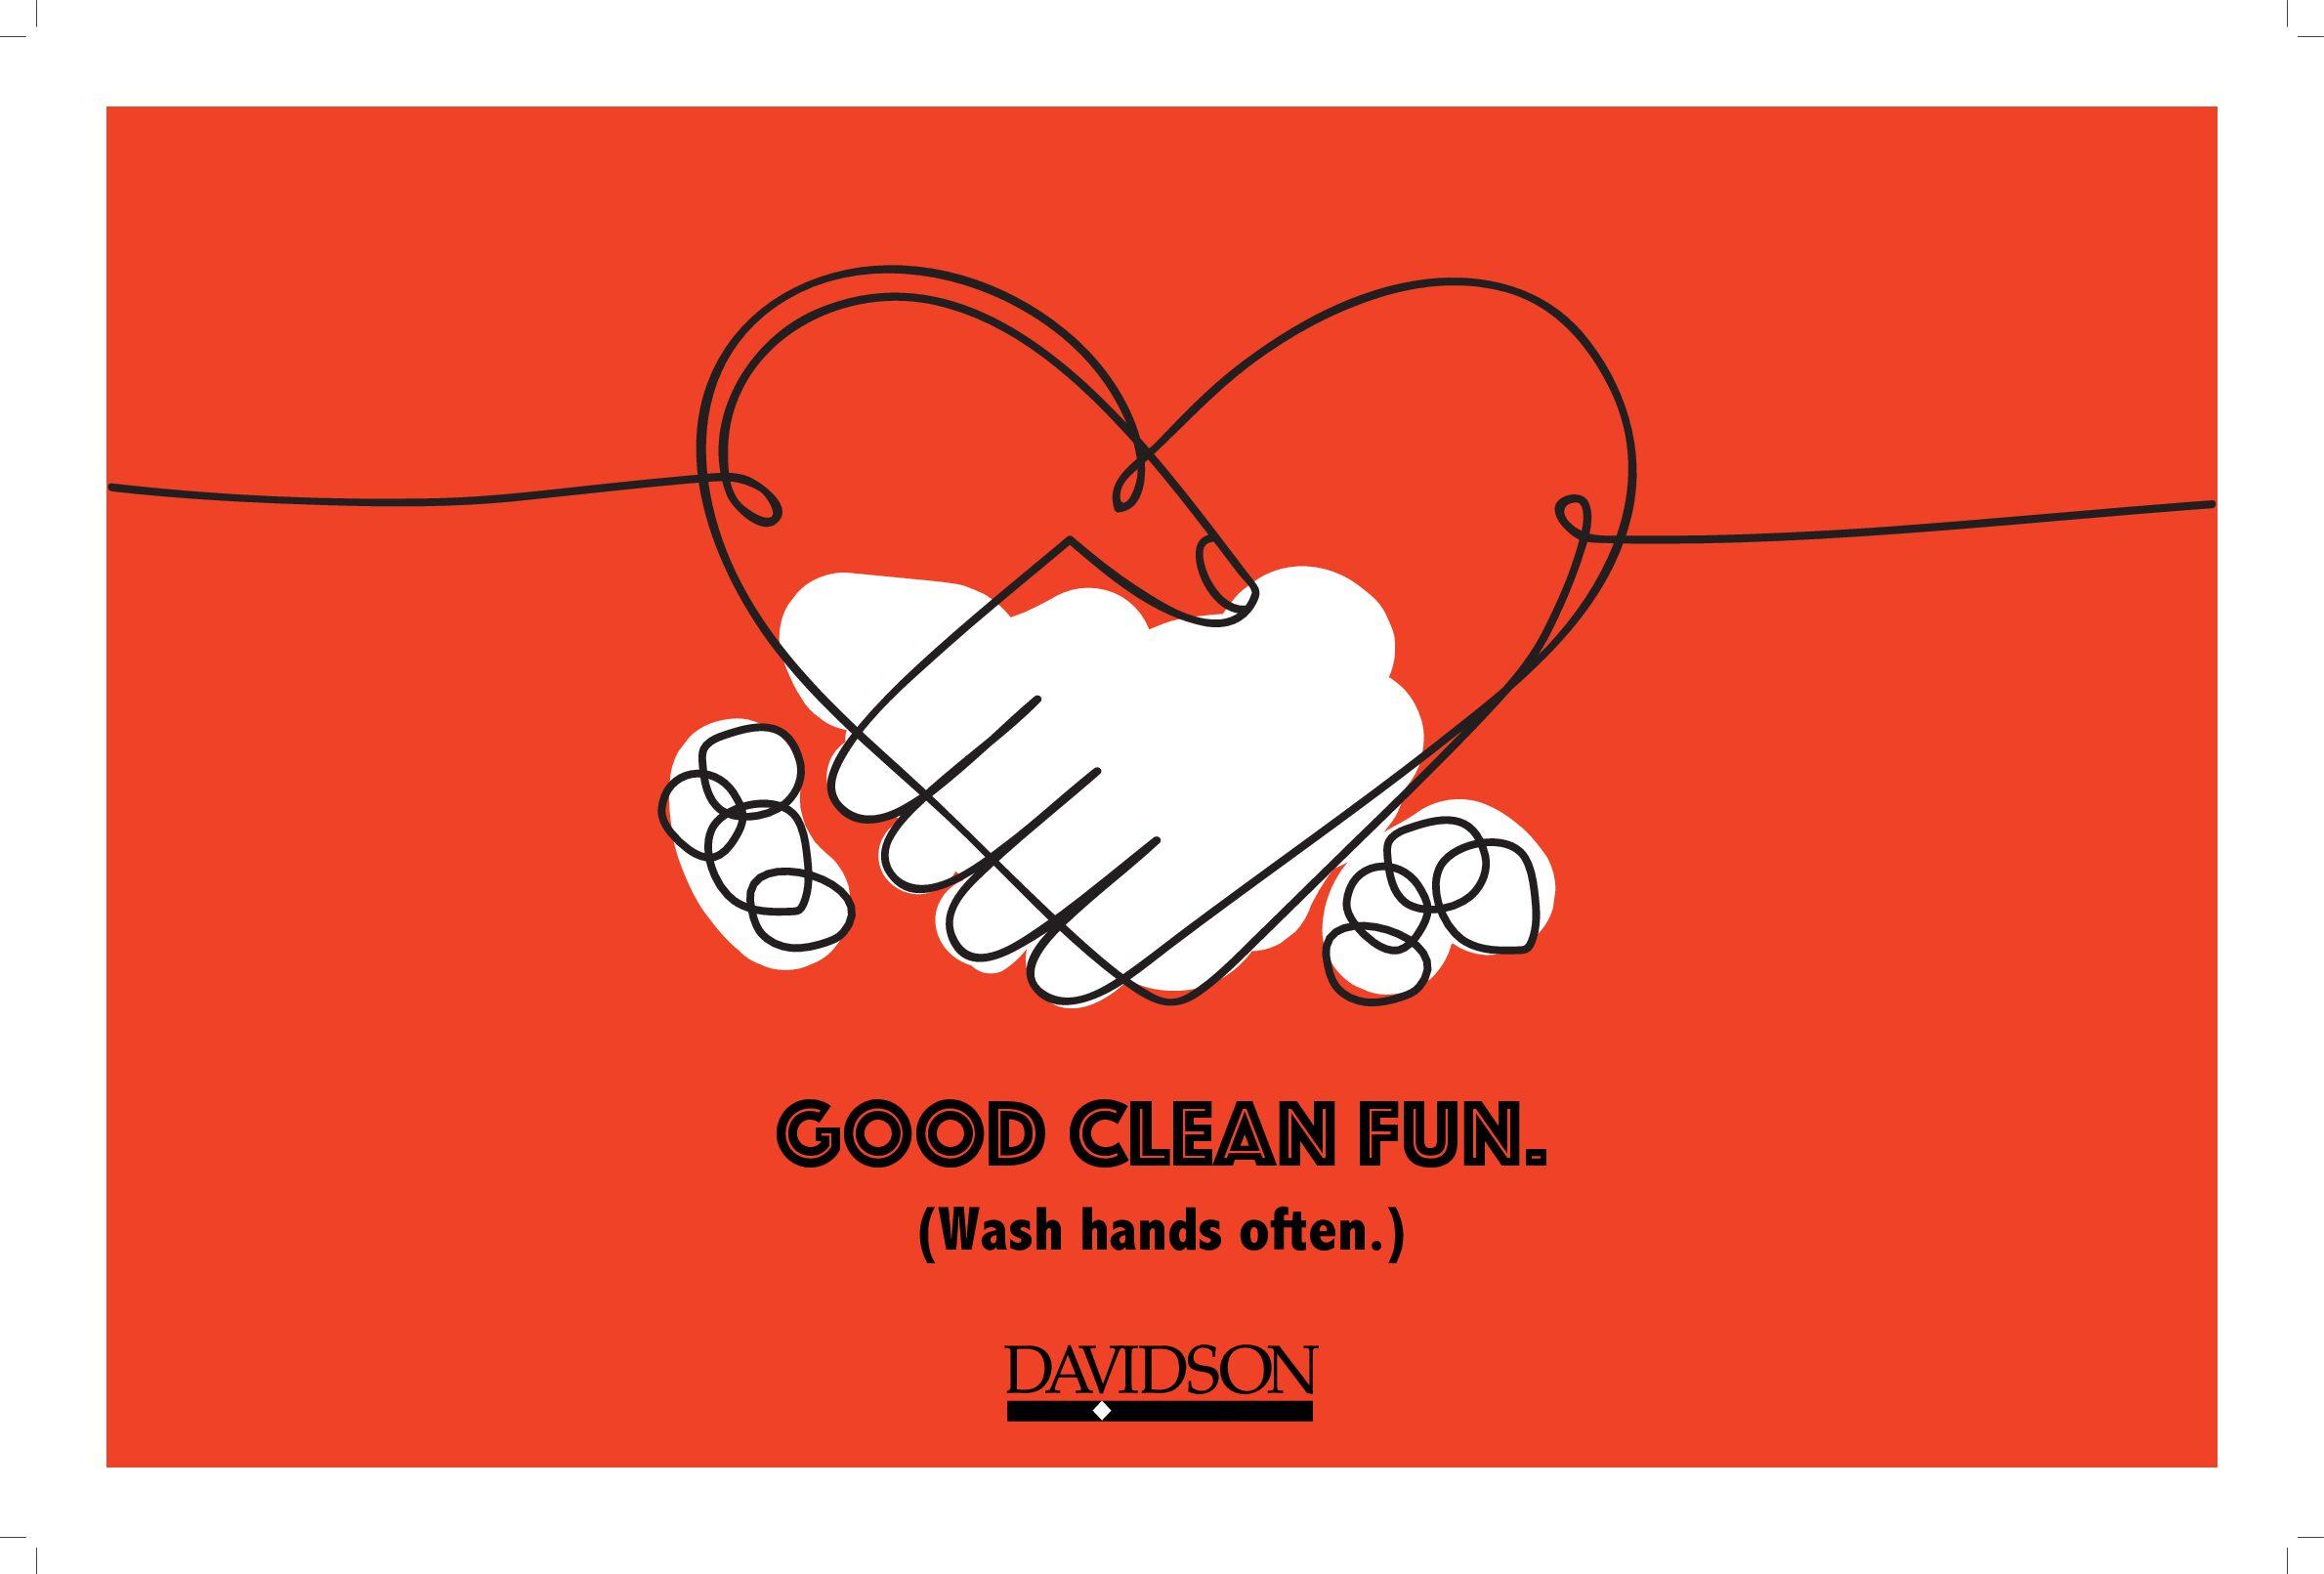 Good, clean fun. Wash hands often.